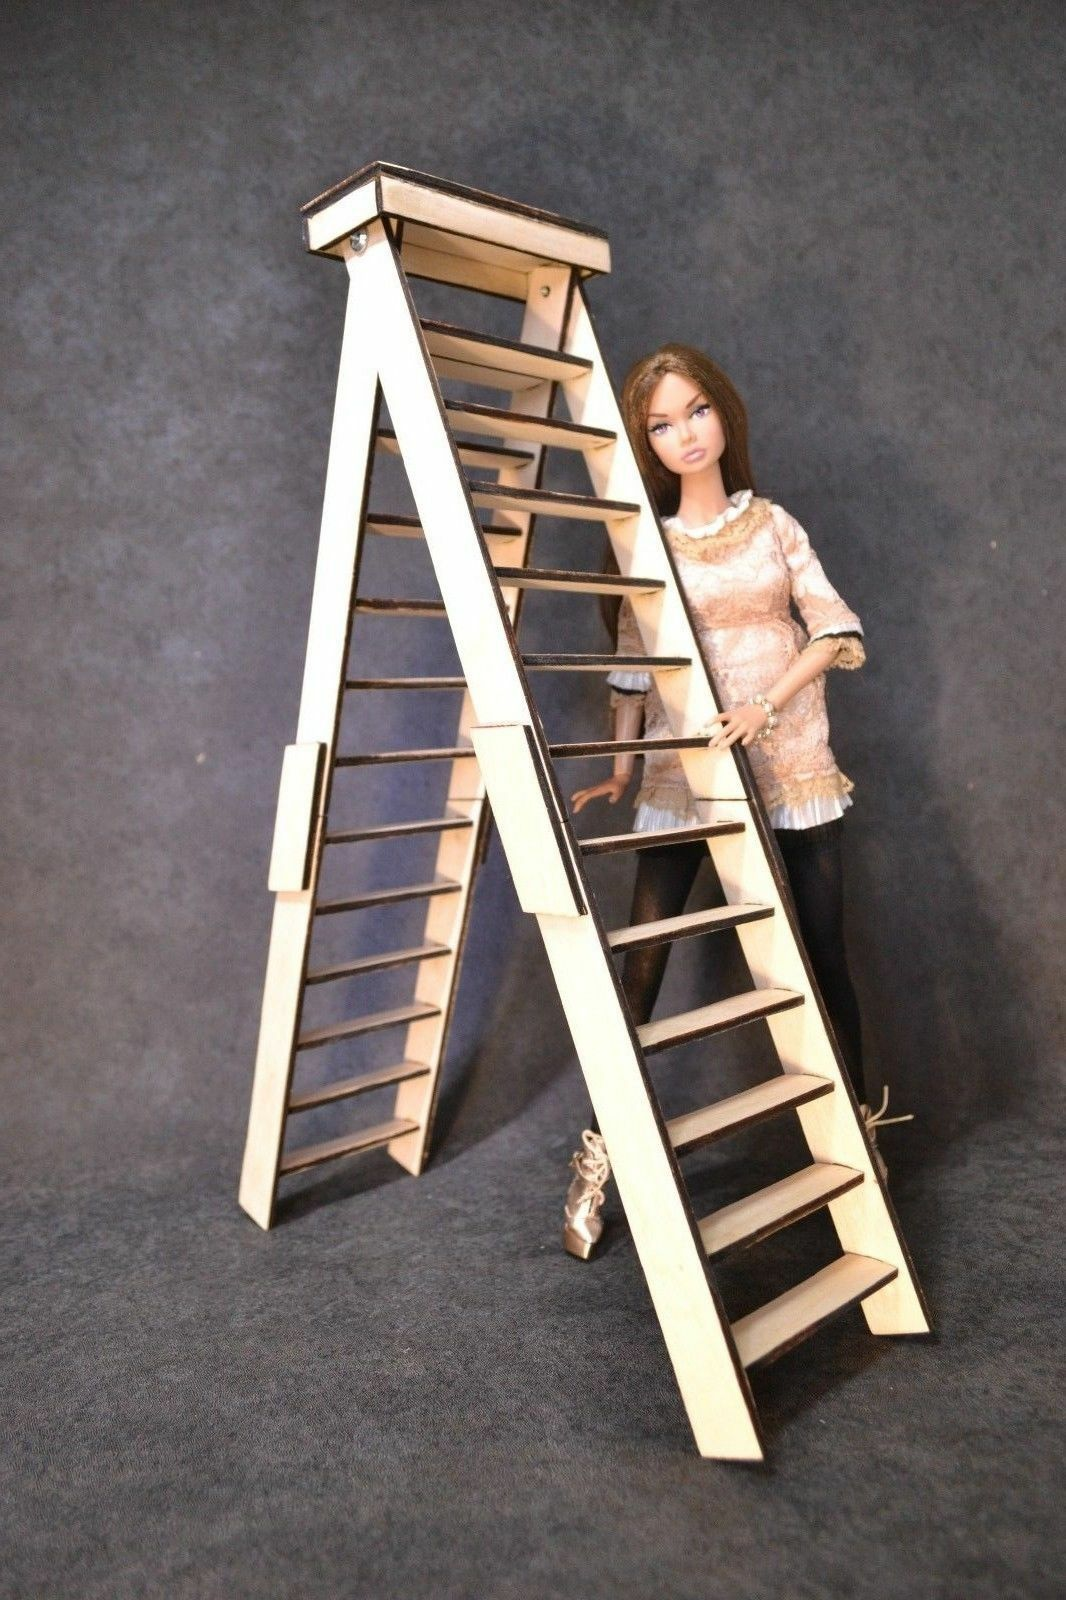 Escalera Escalera 1 6 Muebles Para Muñecas Barbie FR Hecho a Mano Diorama HQ